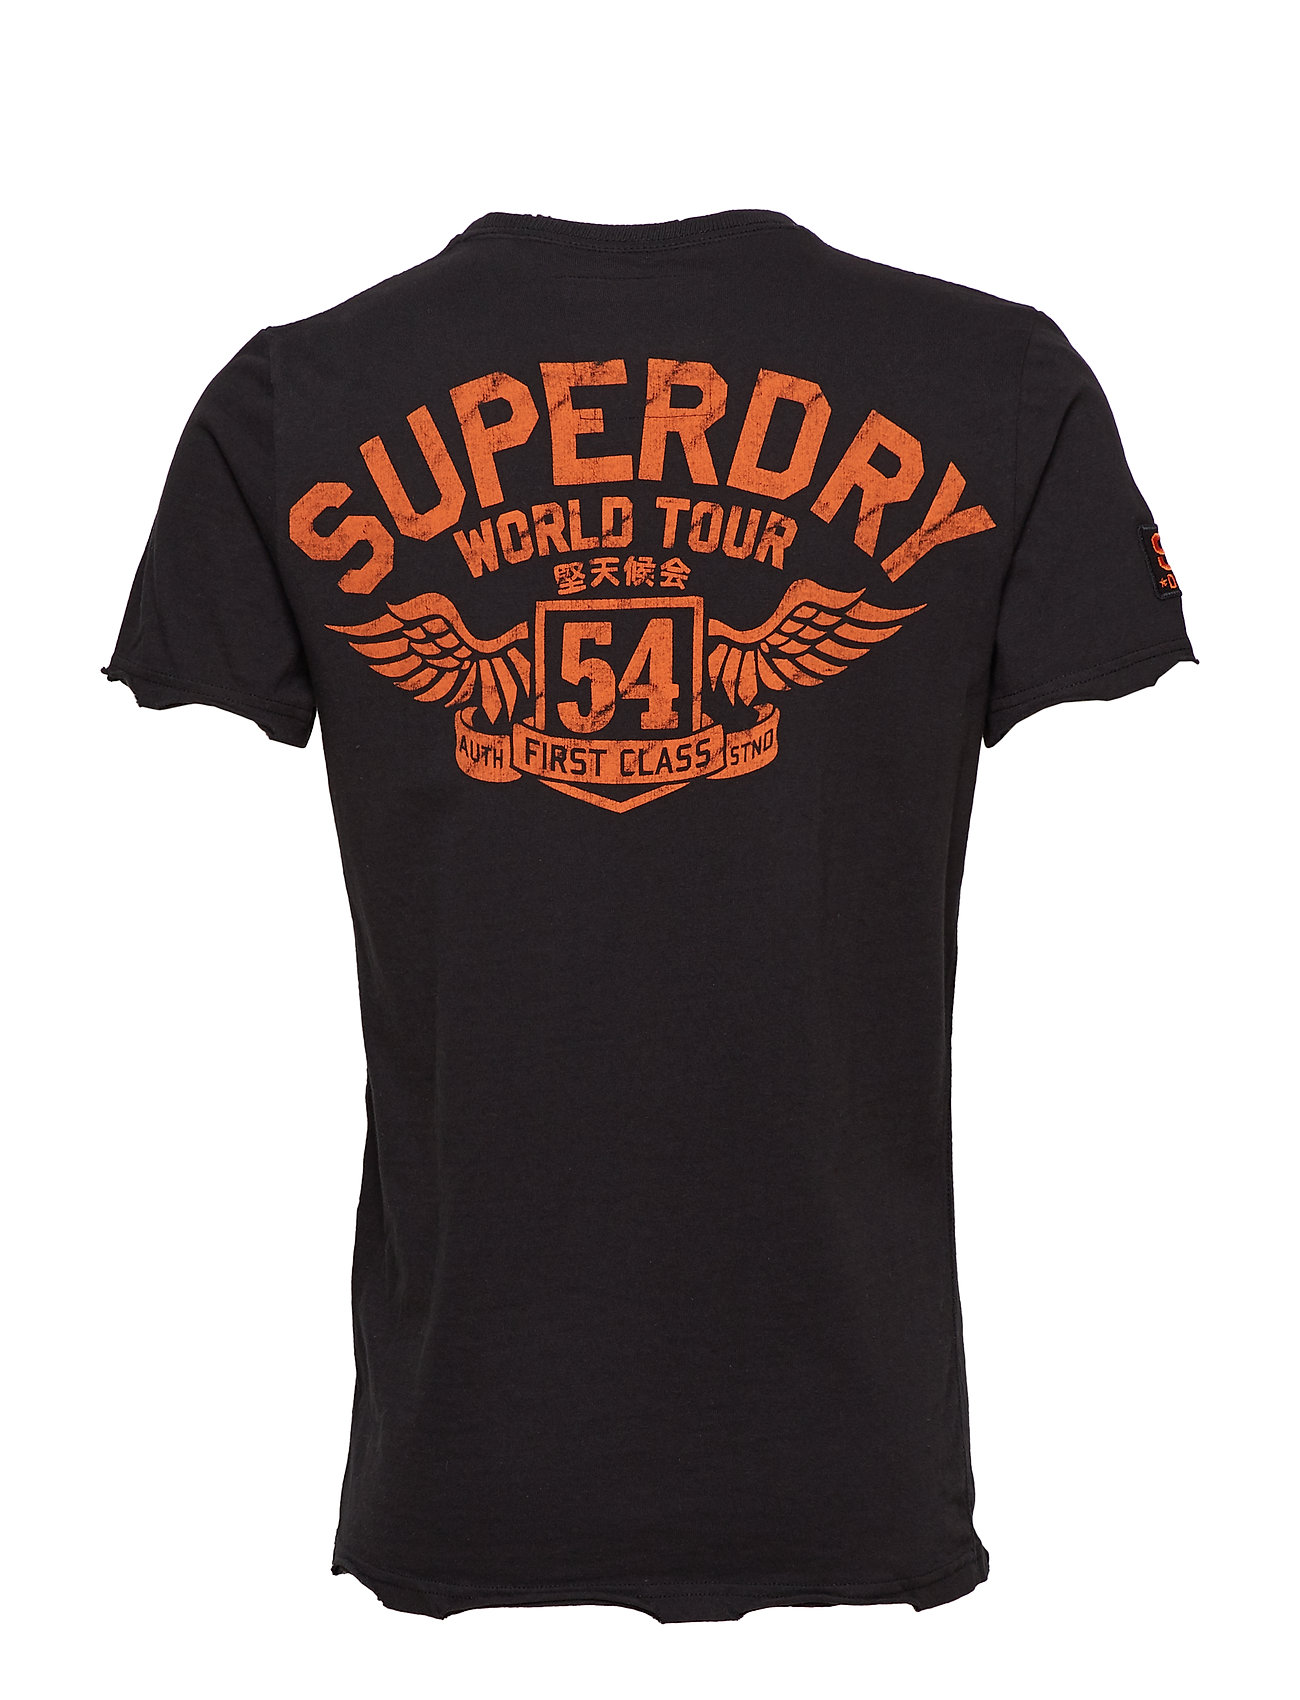 Royal Tour Teepenny BlackSuperdry World Tour World 5LRqj34A